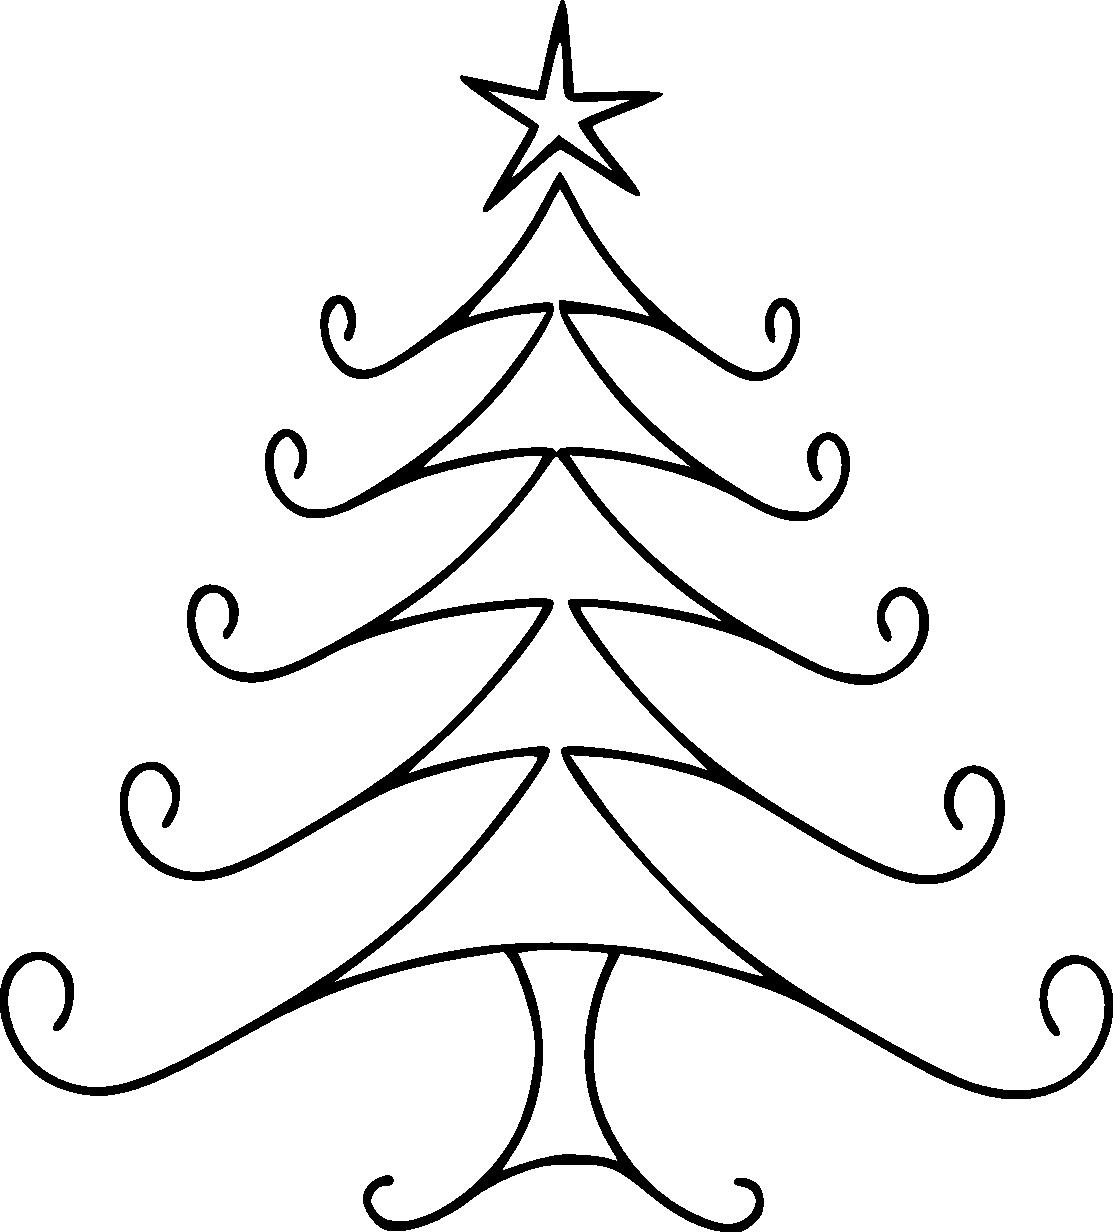 1113x1232 poinsettia clipart lines, poinsettia lines transparent free